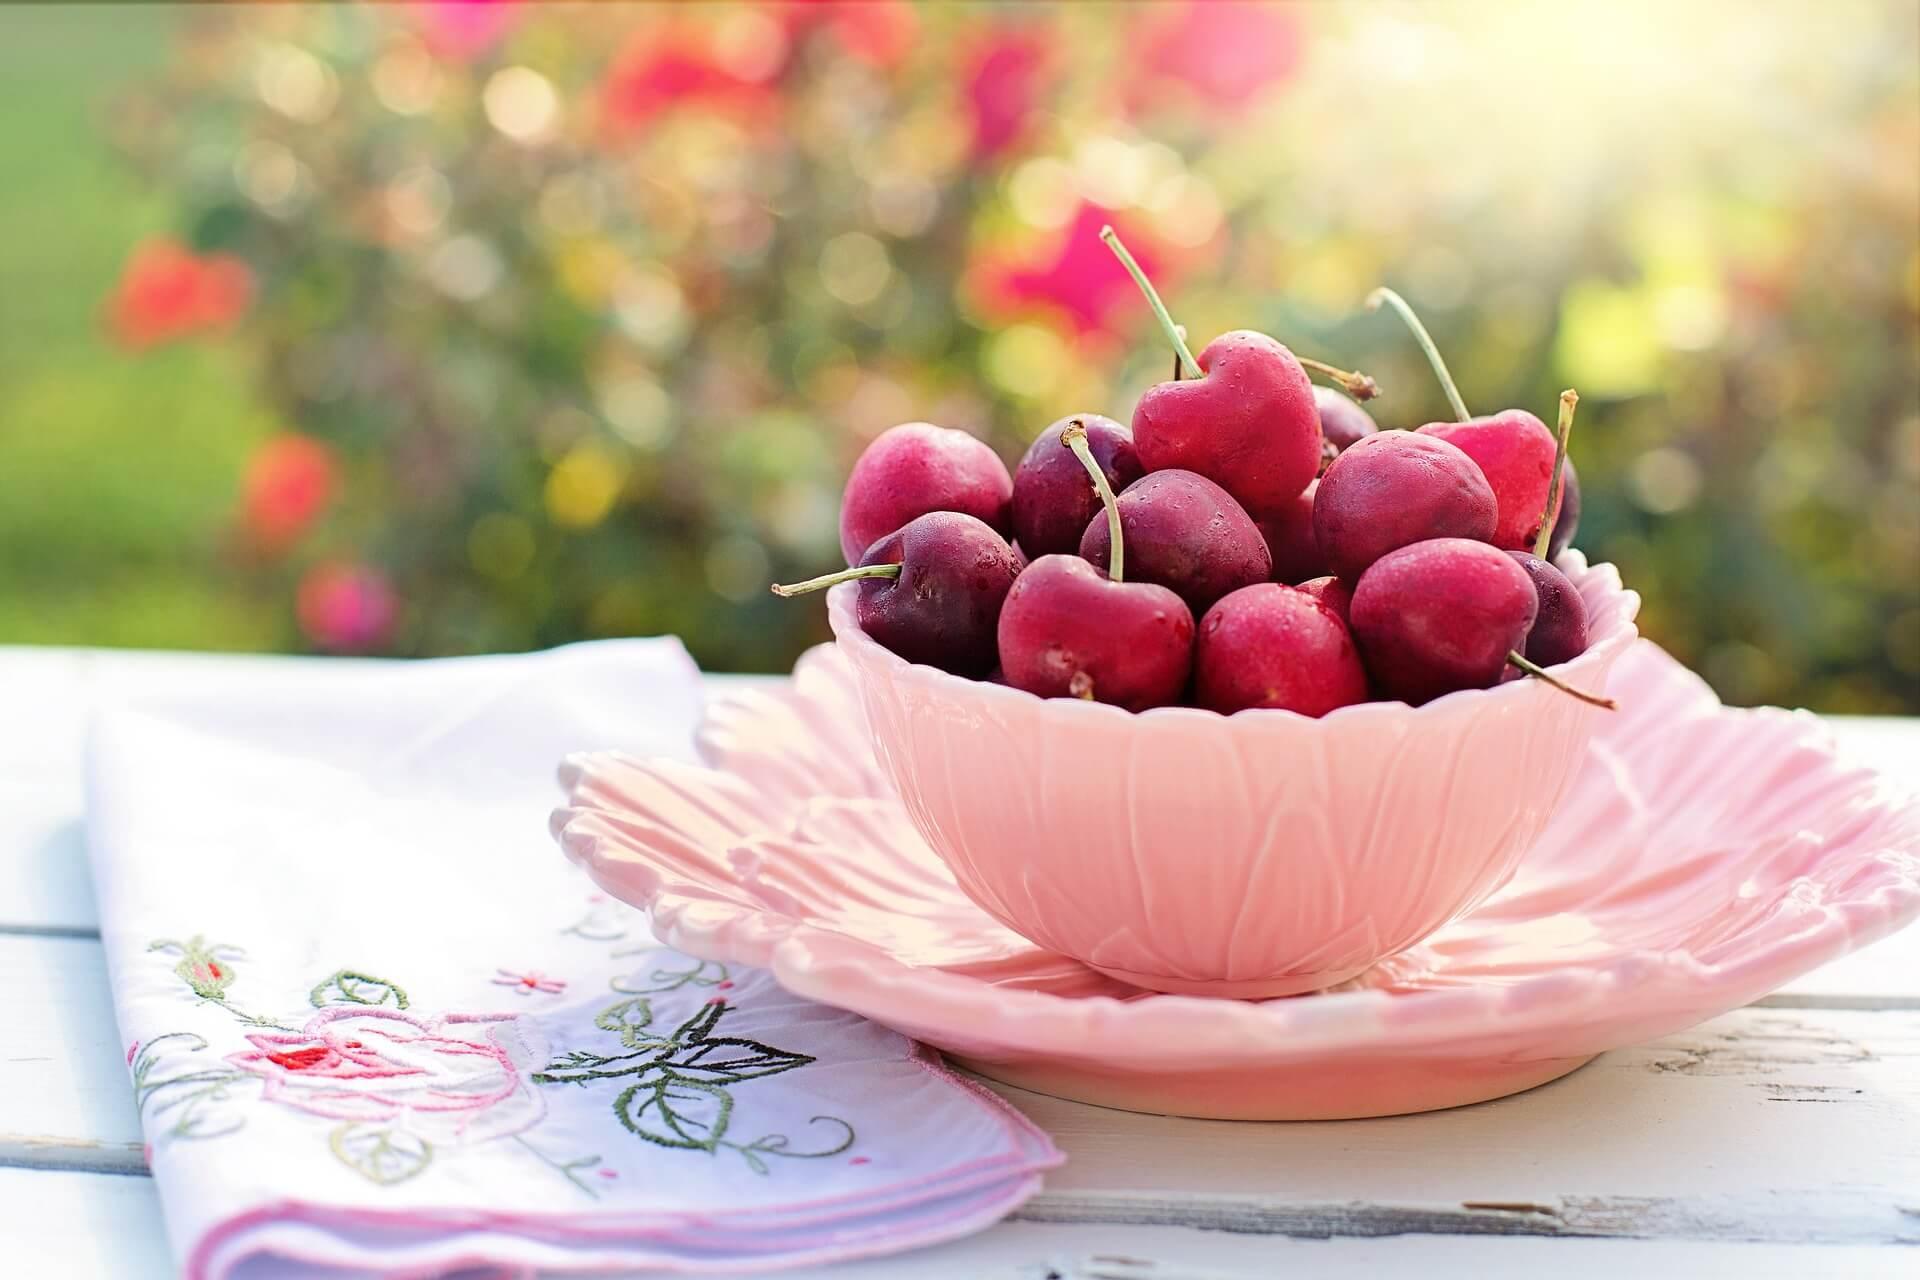 cherries-2402449_1920 (1).jpg